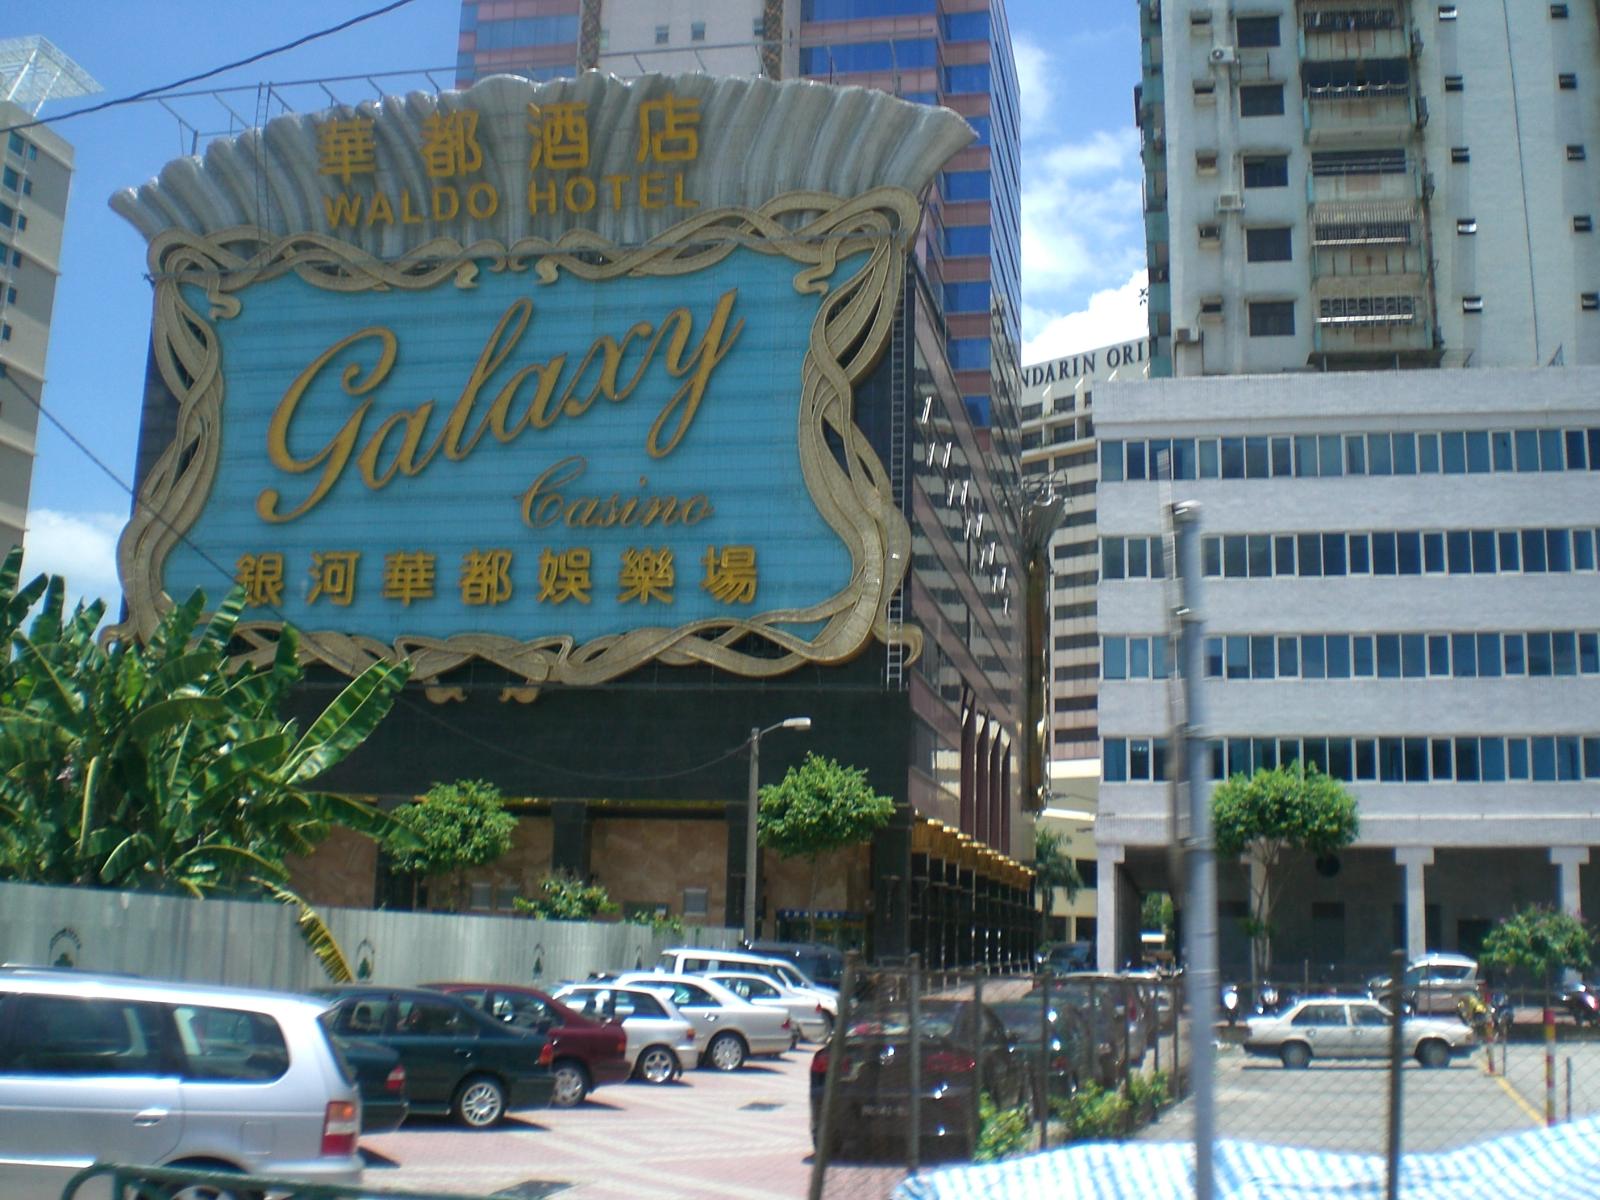 File:Macau Galaxy Casino Waldo Hotel 1.JPG